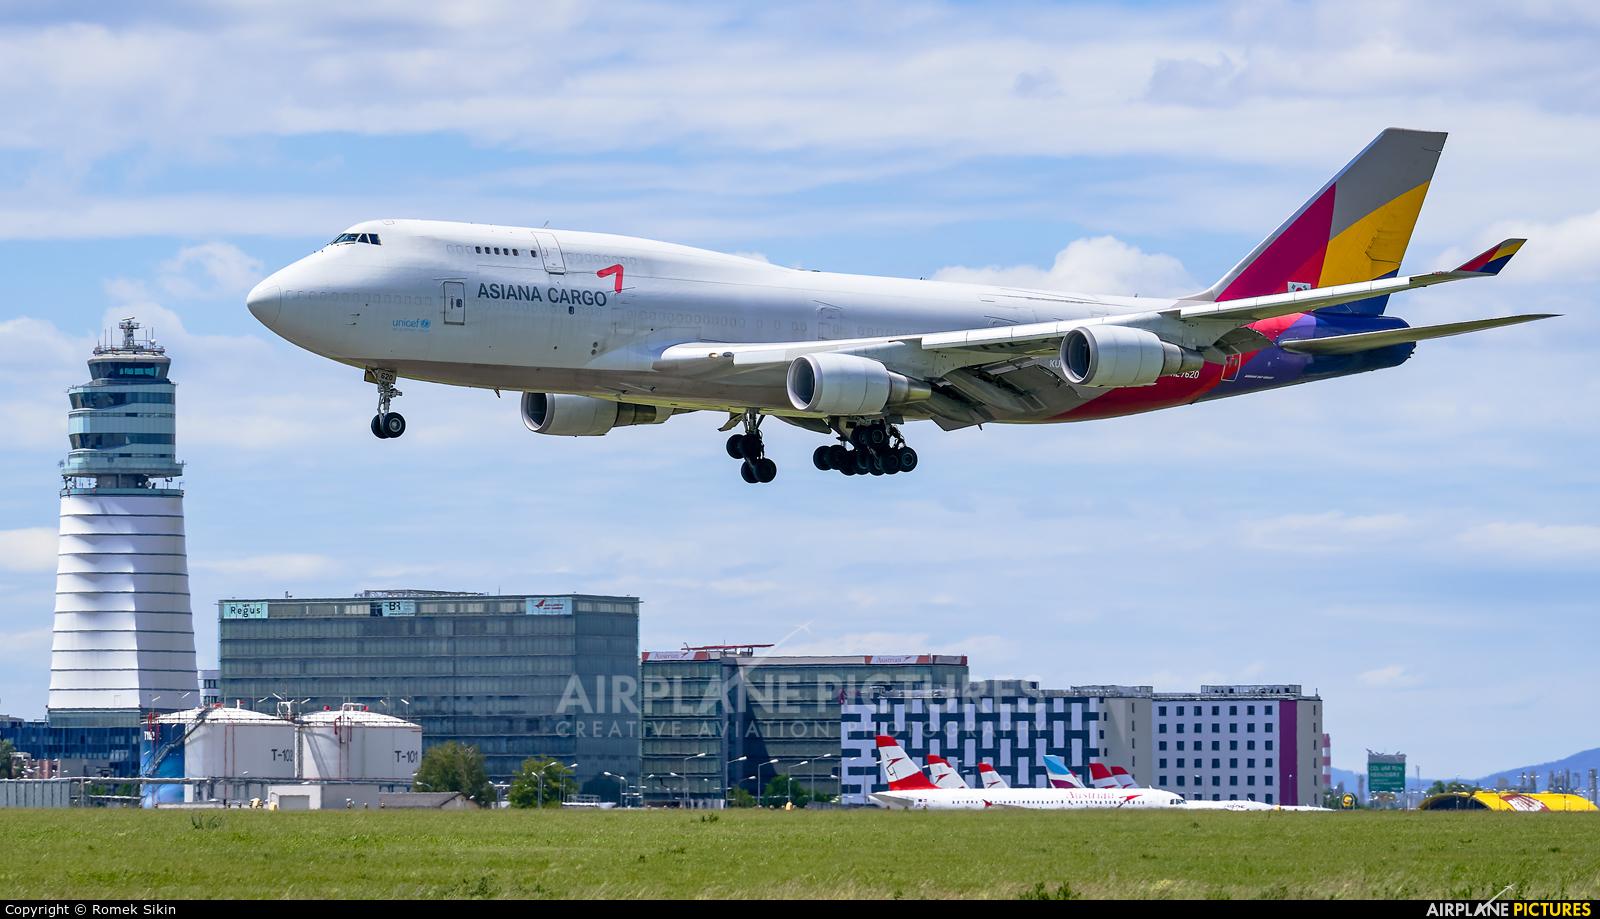 Asiana Cargo HL7620 aircraft at Vienna - Schwechat